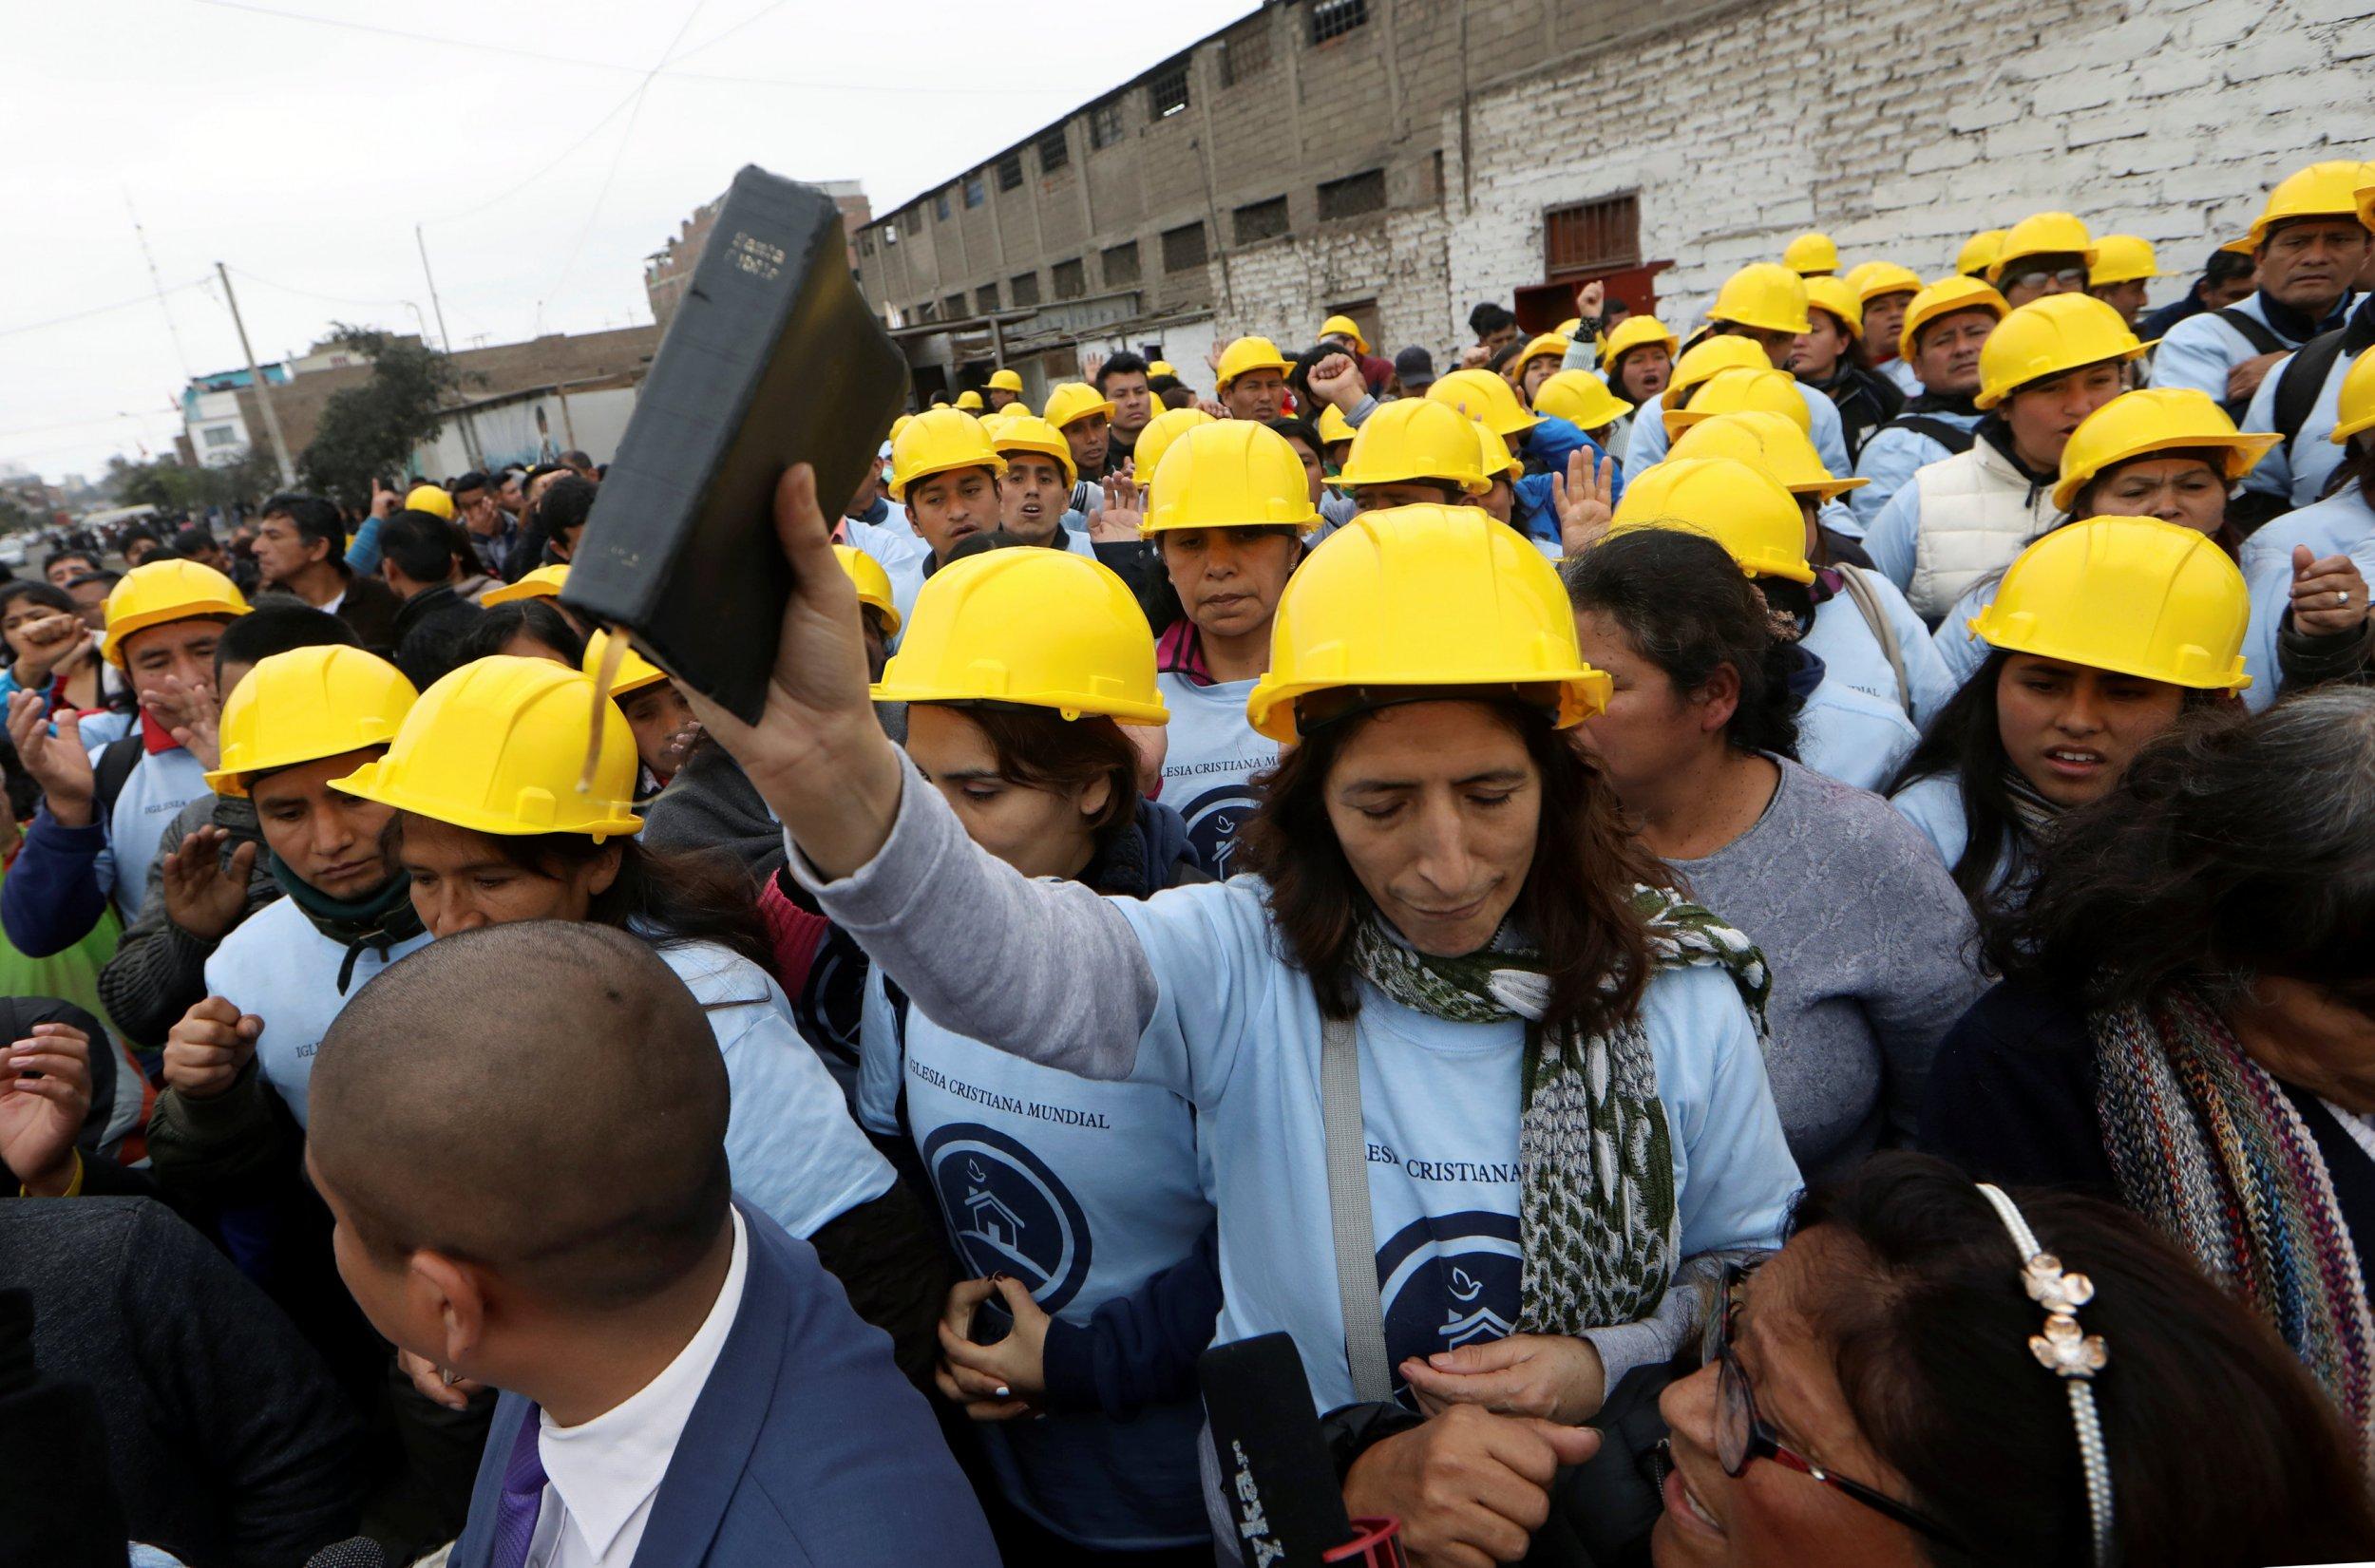 2018-09-10T194632Z_1_LYNXNPEE891GN_RTROPTP_4_SOCCER-PERU